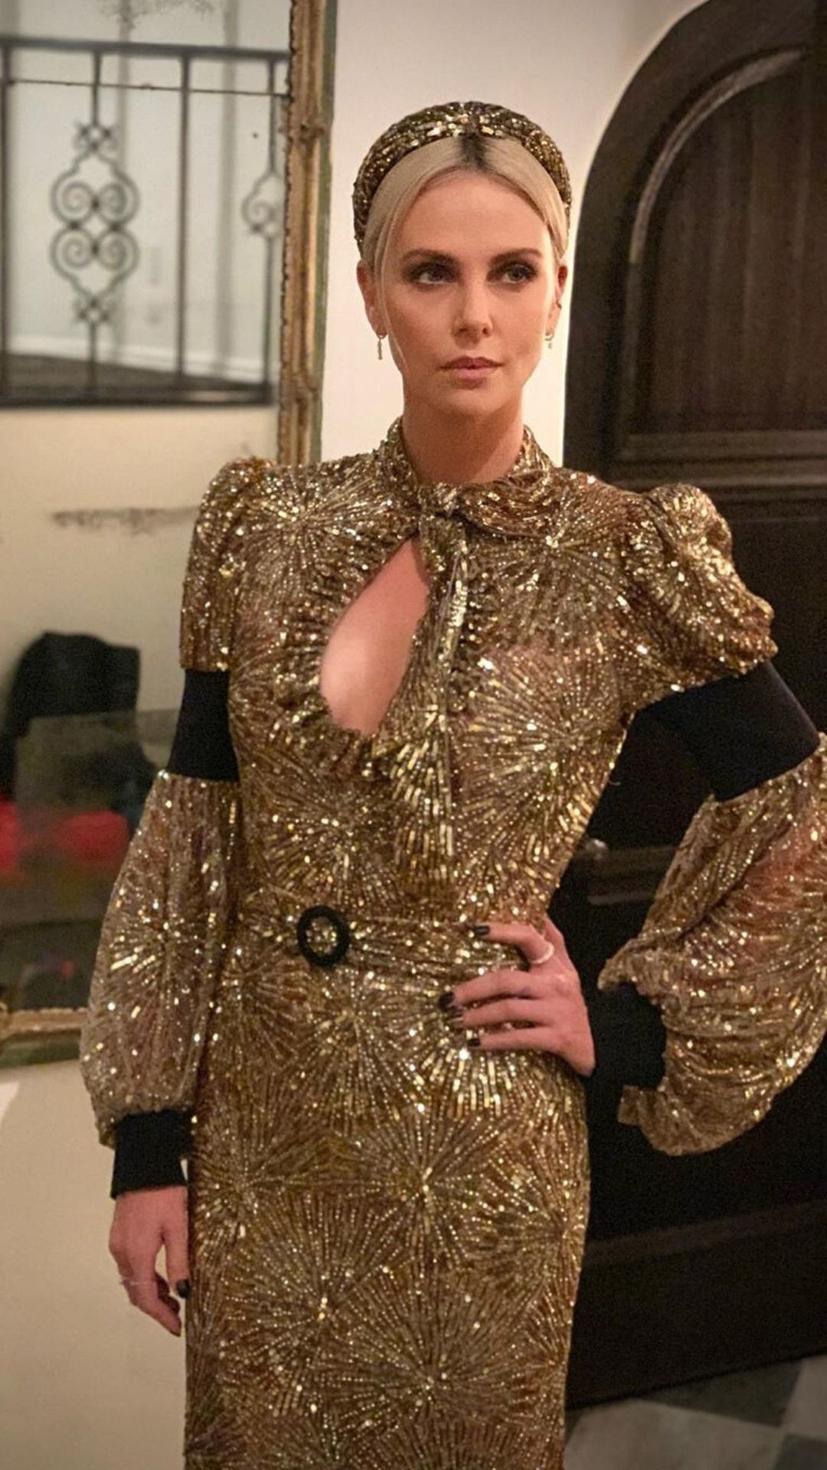 Charlize Theron in a dazzling gold Louis Vuitton ensemble